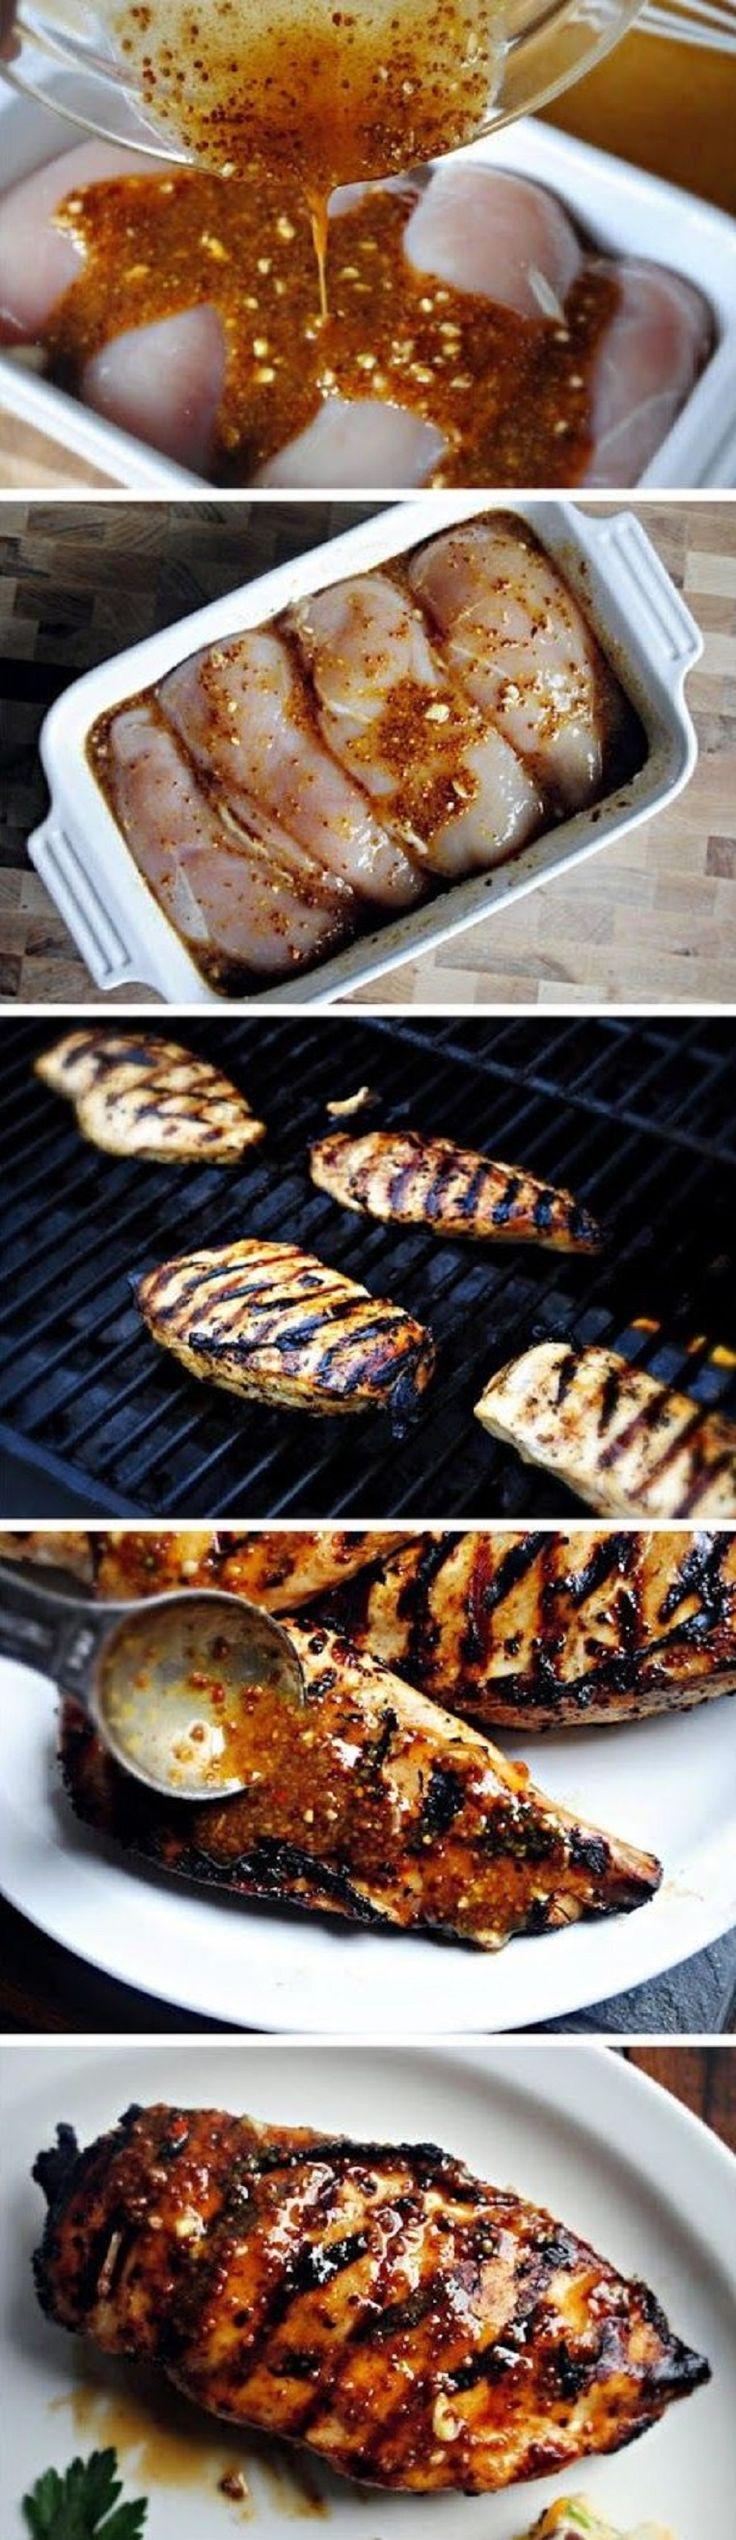 Grilled Honey Mustard Chicken - 15 Grilled Chicken Recipes to Make This Summer…